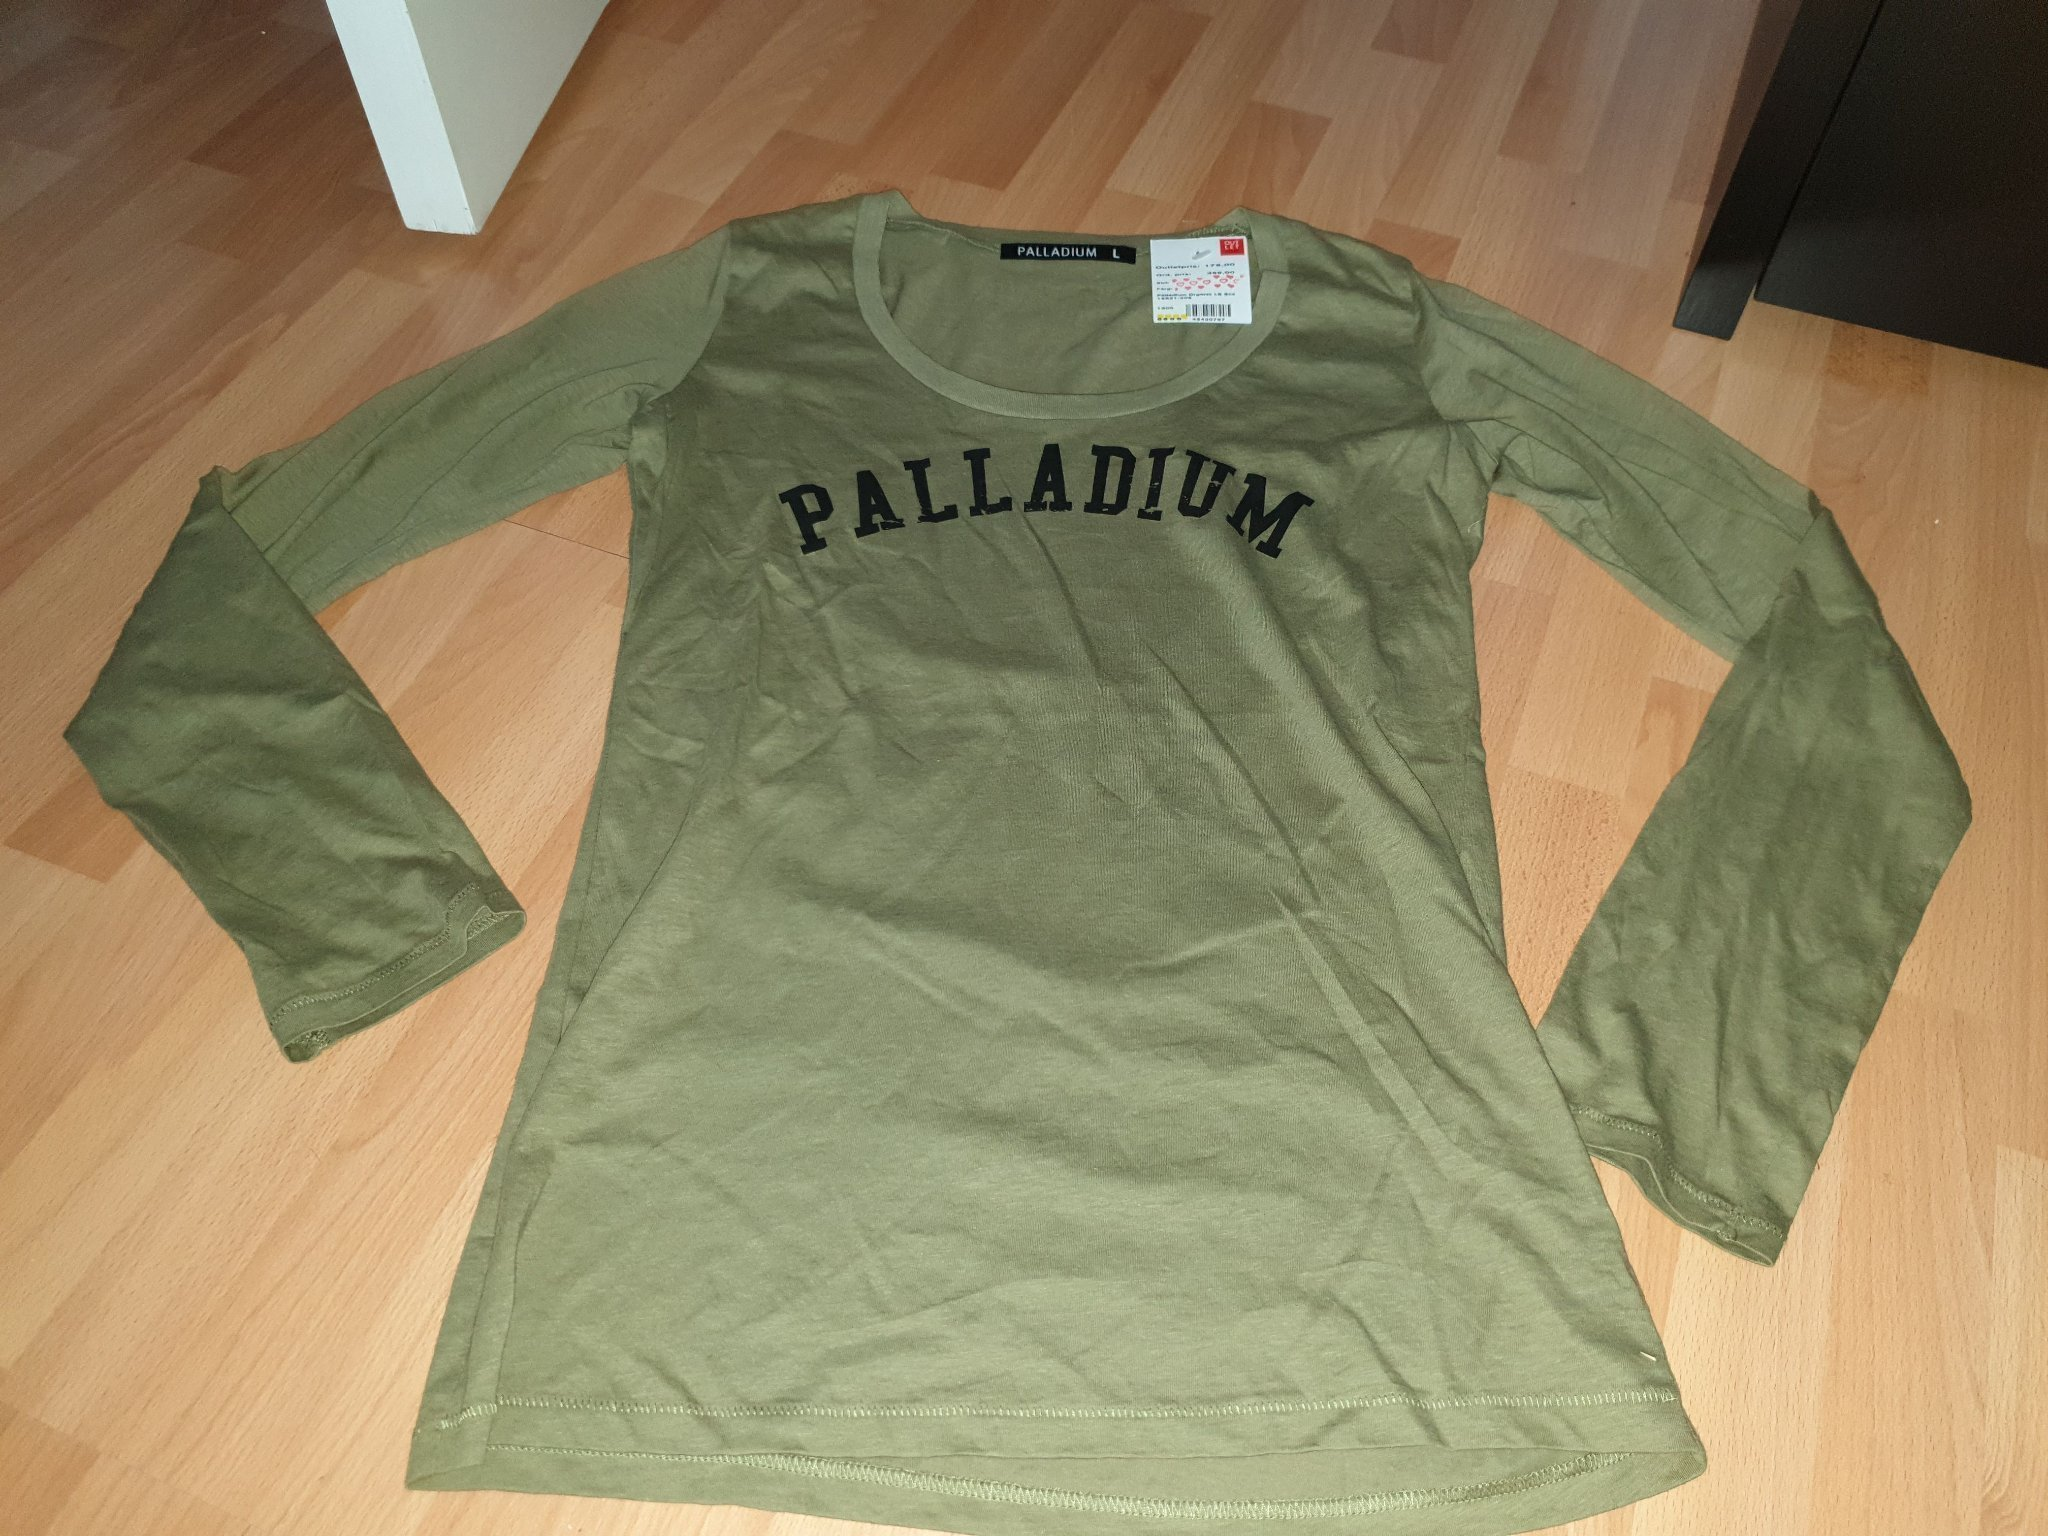 popularne sklepy przemyślenia na temat ceny detaliczne Palladium långärmad tröja i storlek L (368468935) ᐈ Köp på ...